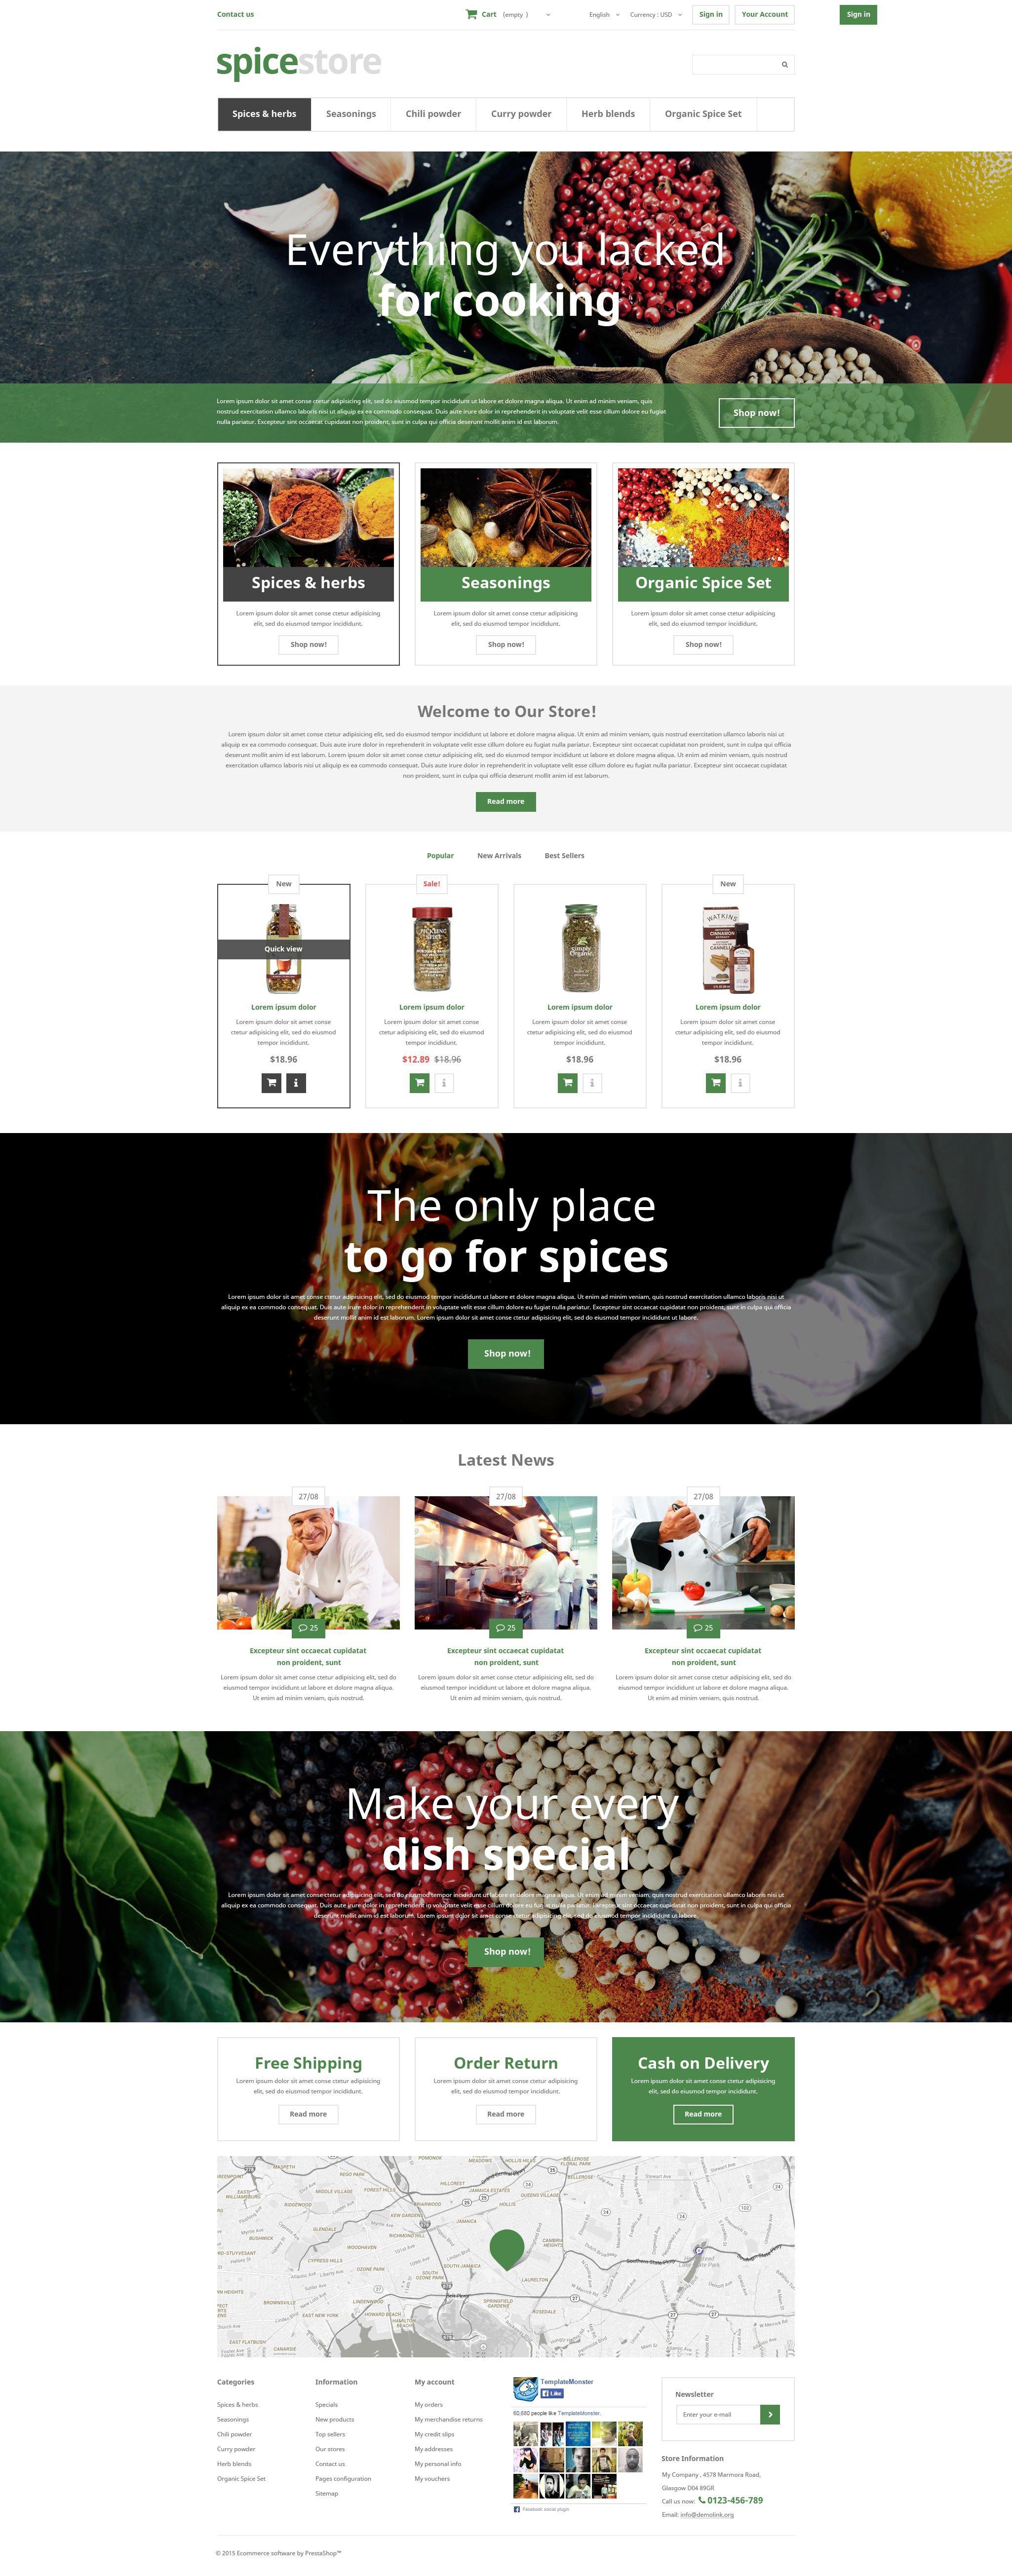 Responsywny szablon PrestaShop clean ecommerce store spicy flavour shop cook pepper salt powder blend cinnamon dried herbs #52962 - zrzut ekranu